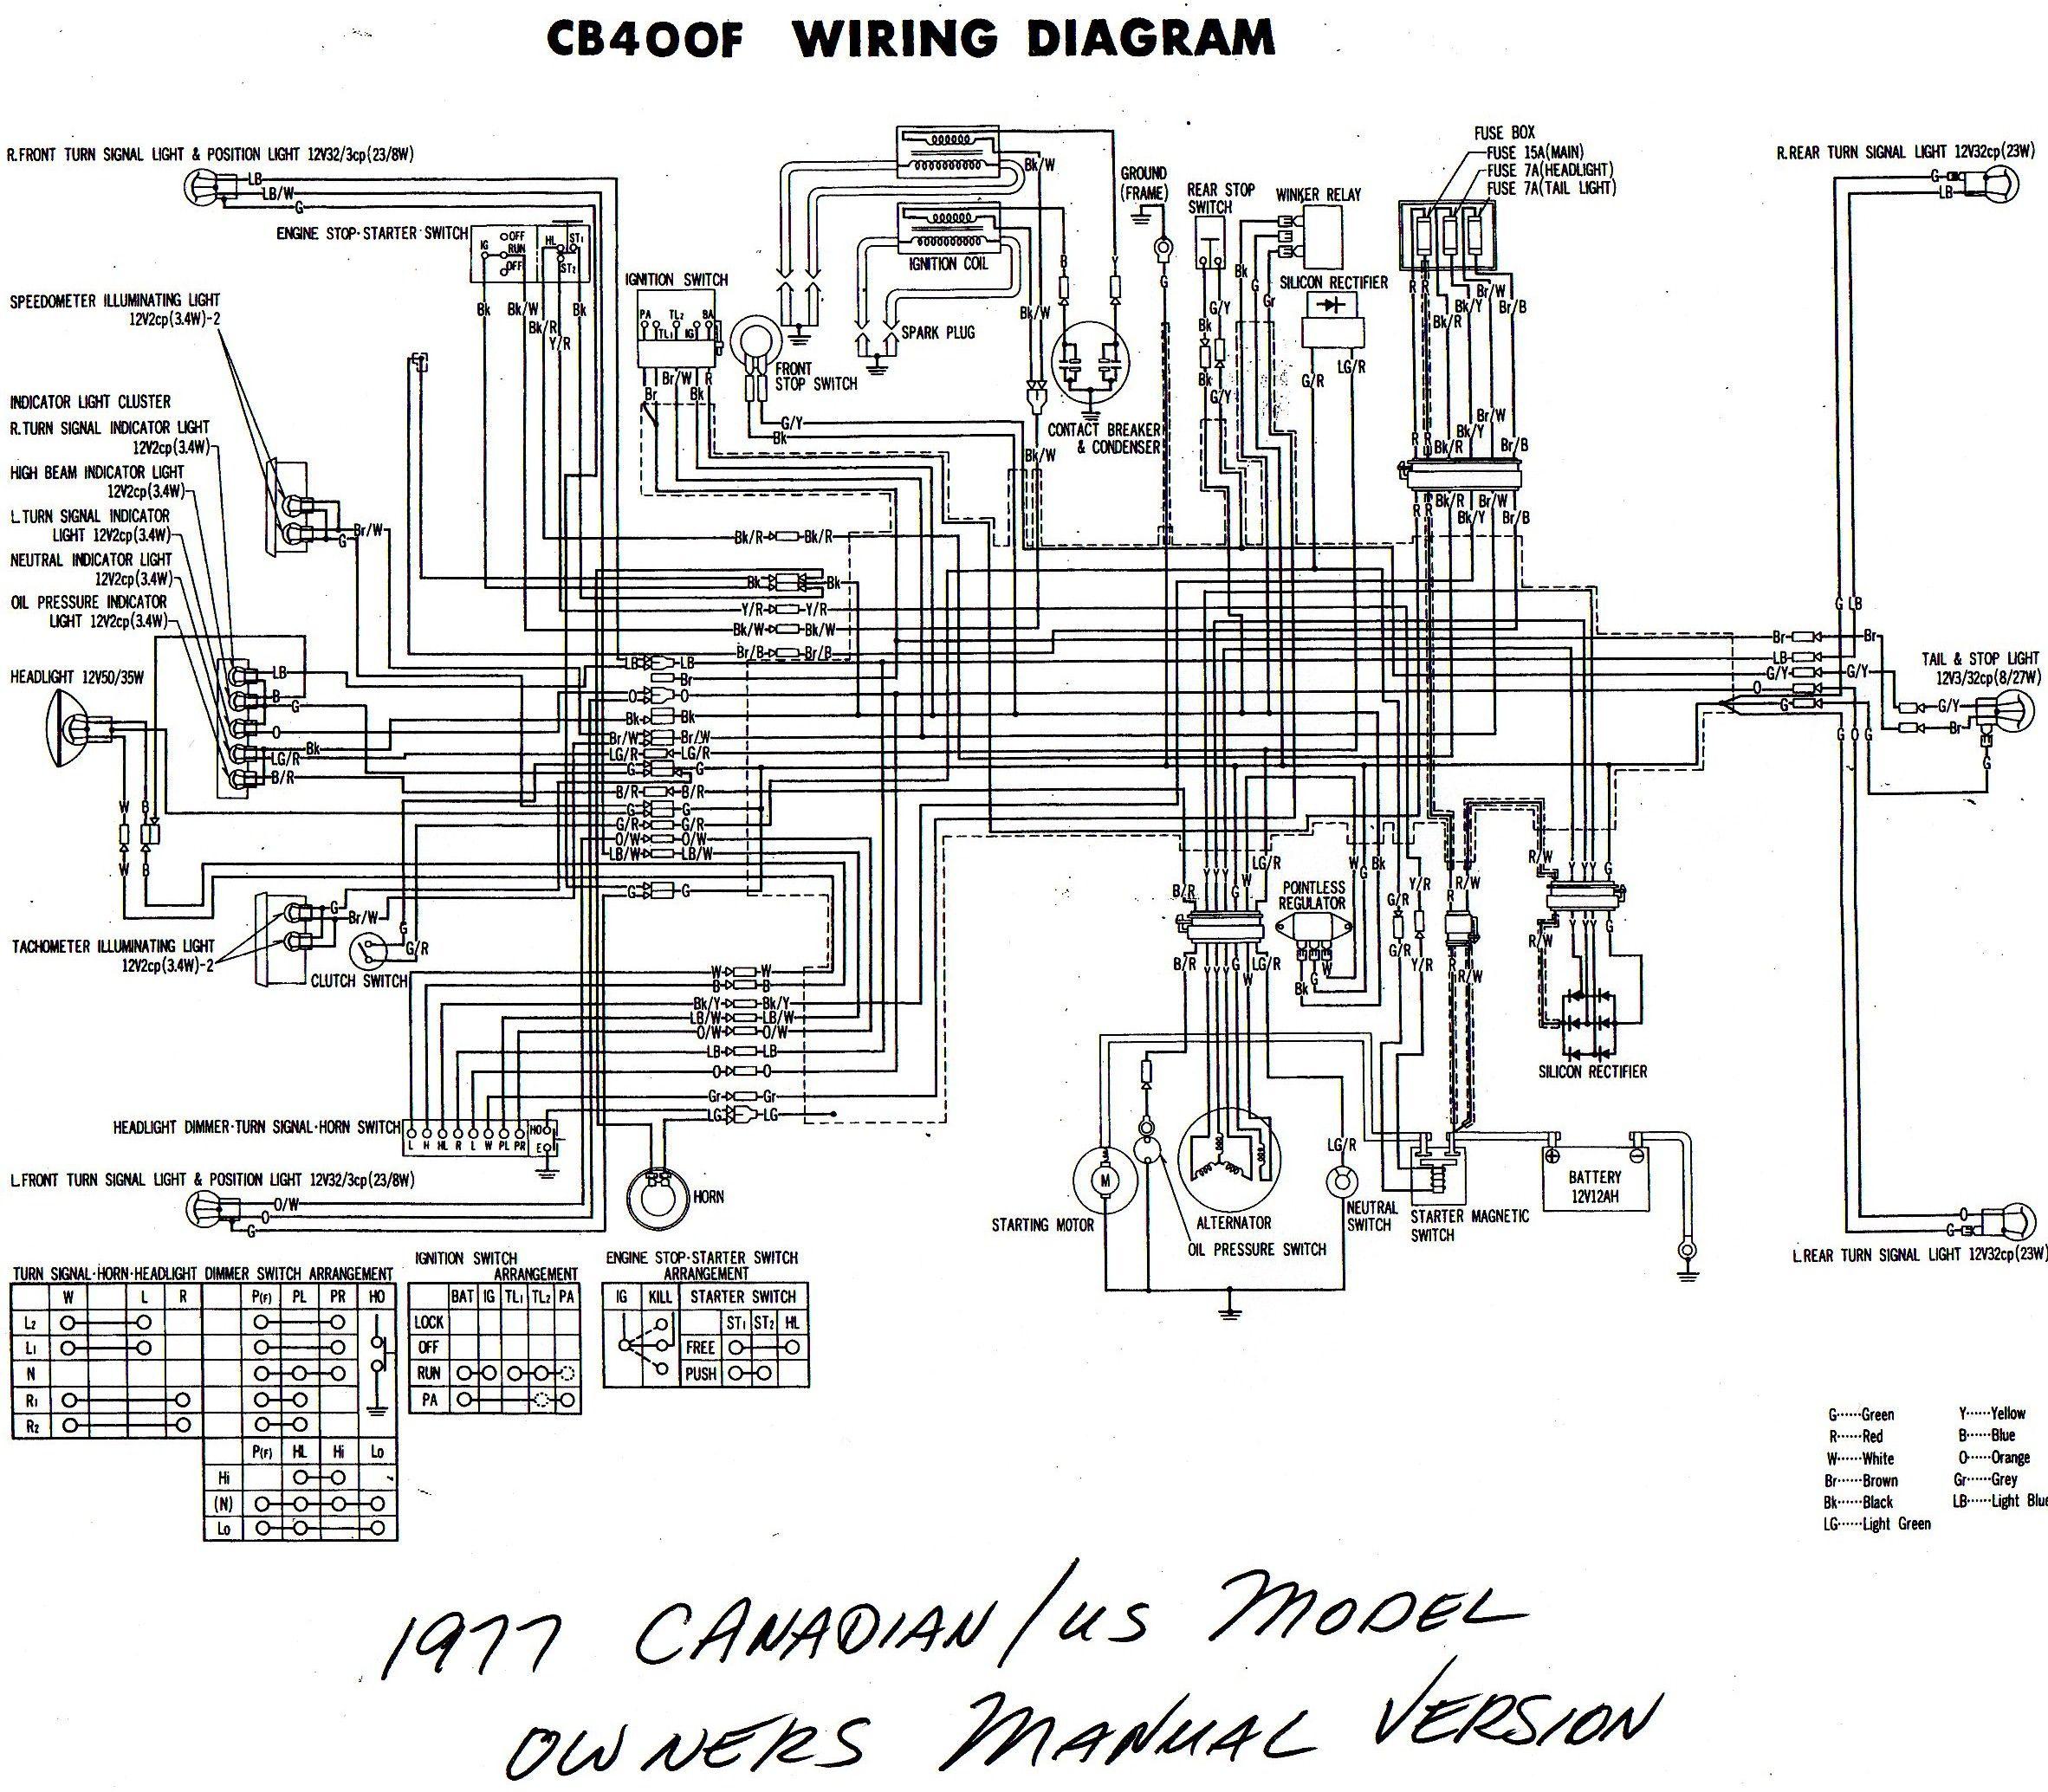 Cb400 Wiring Diagram Volovetsfo